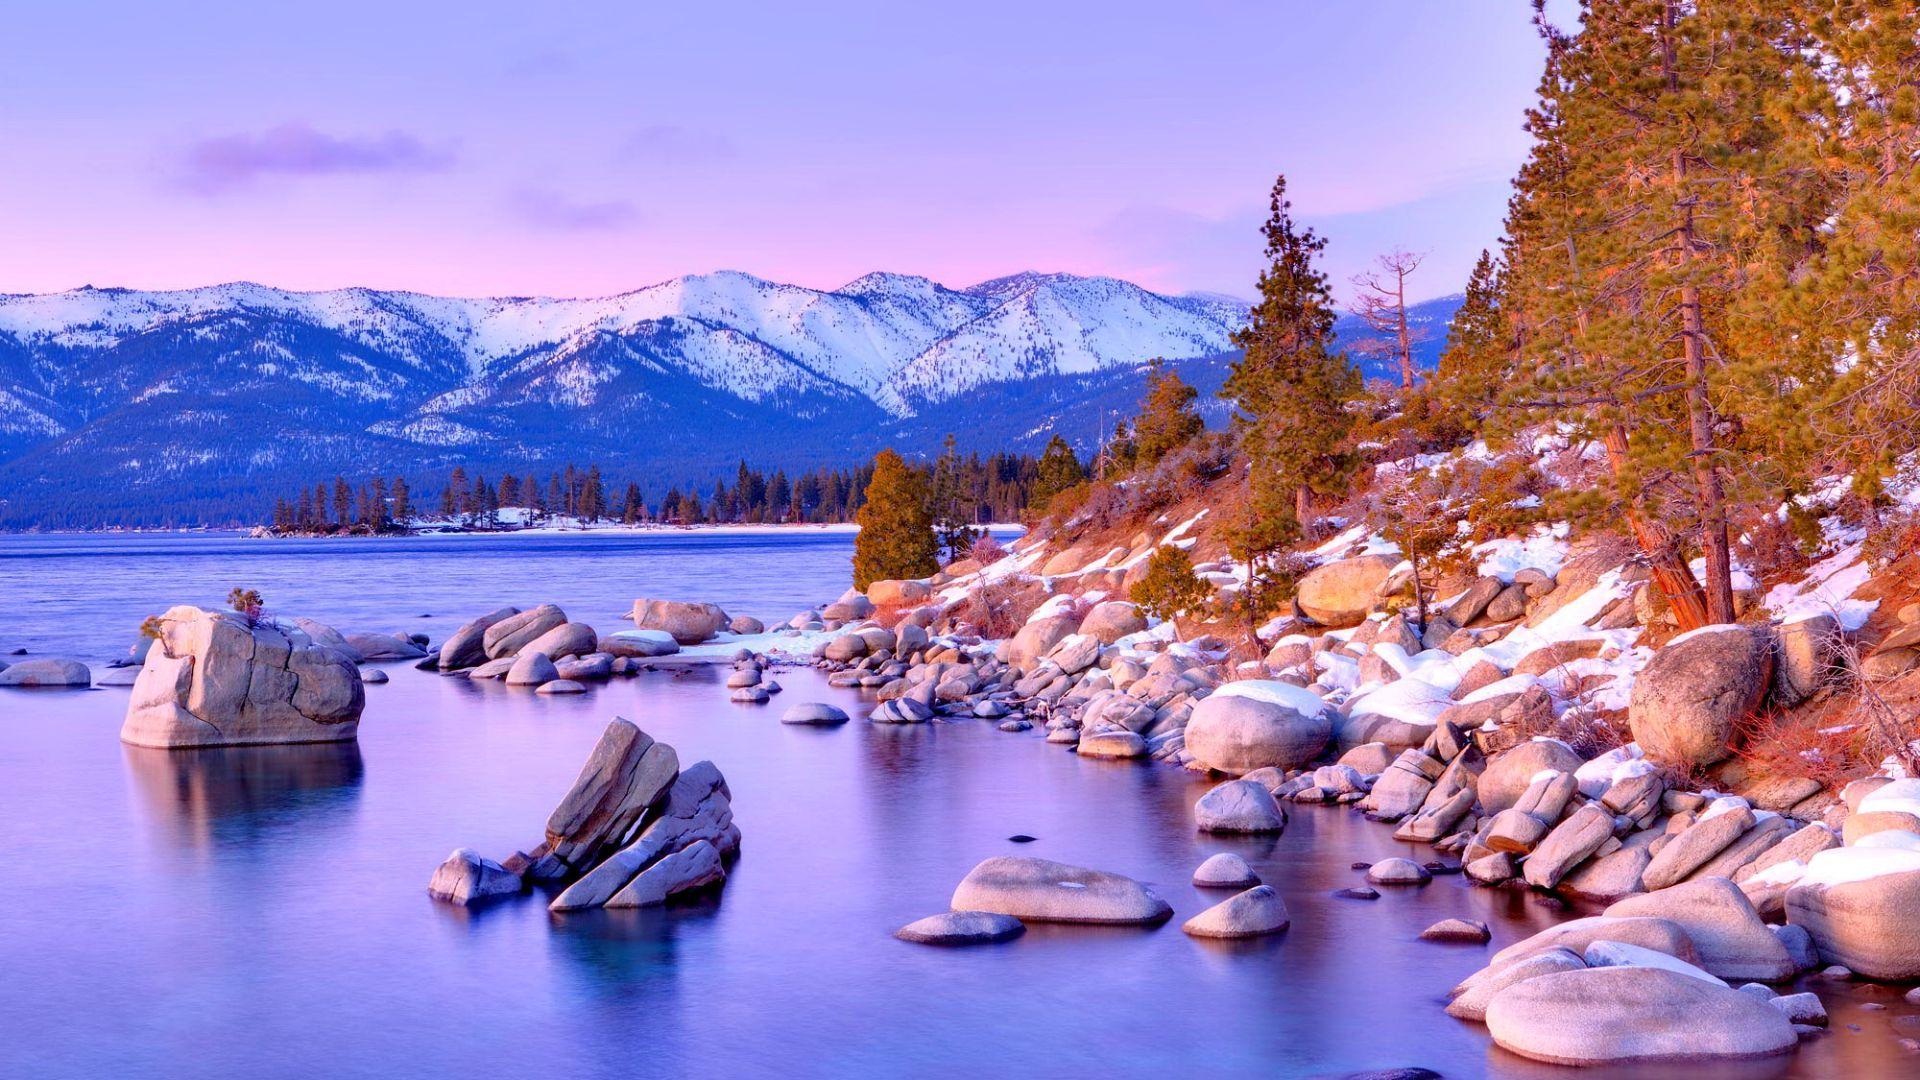 Lake Tahoe wallpaper picture